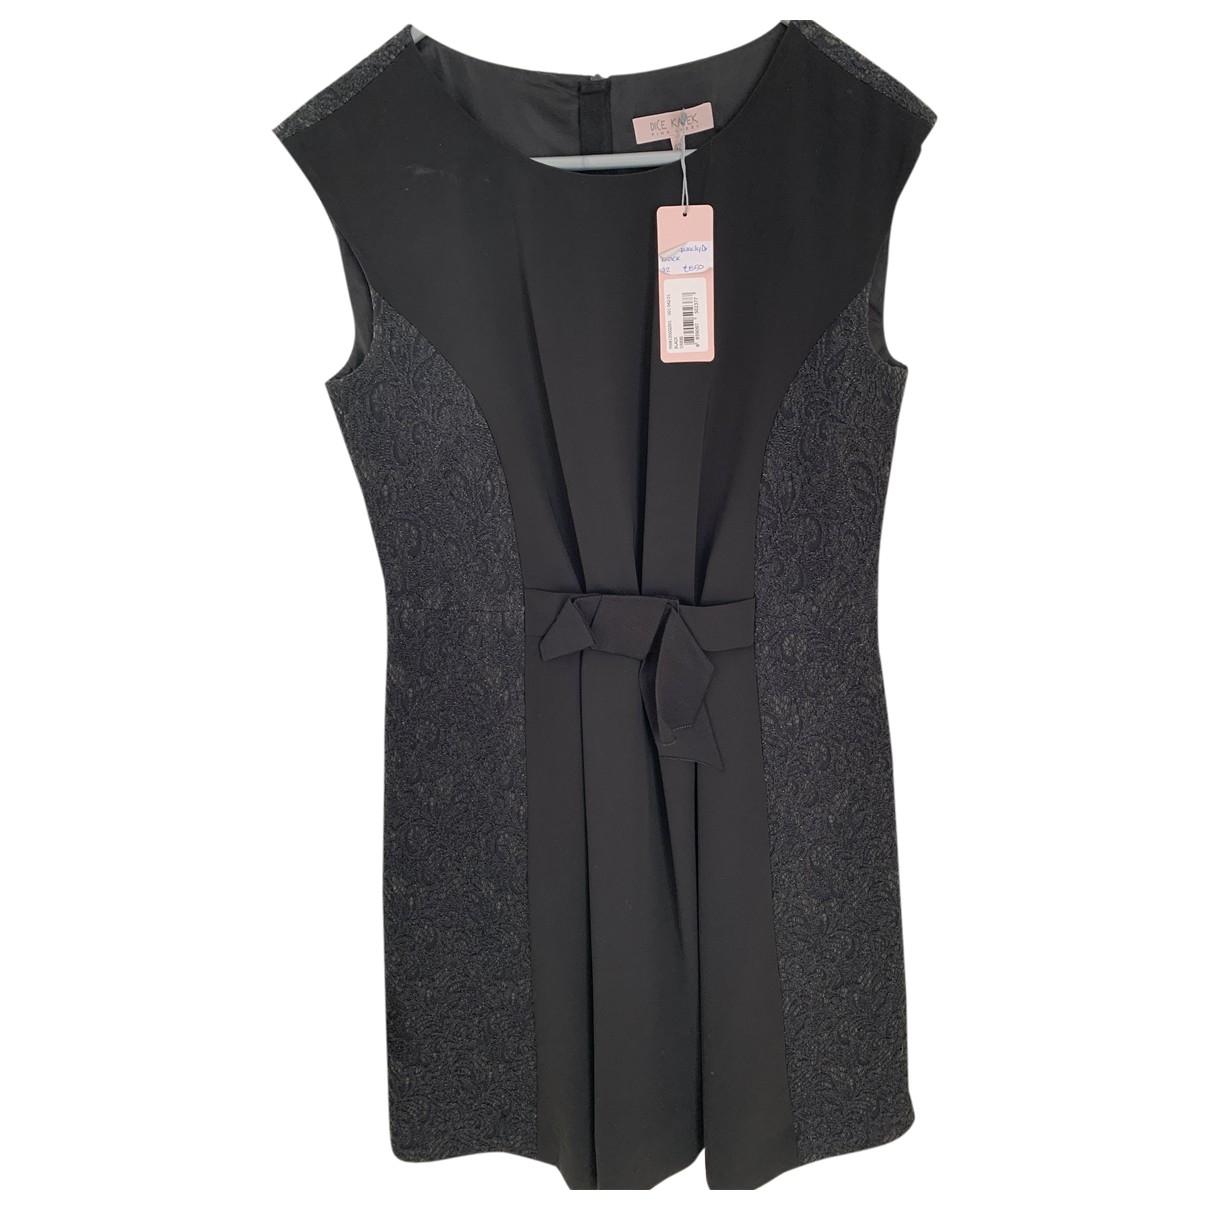 Dice Kayek \N Kleid in  Schwarz Wolle